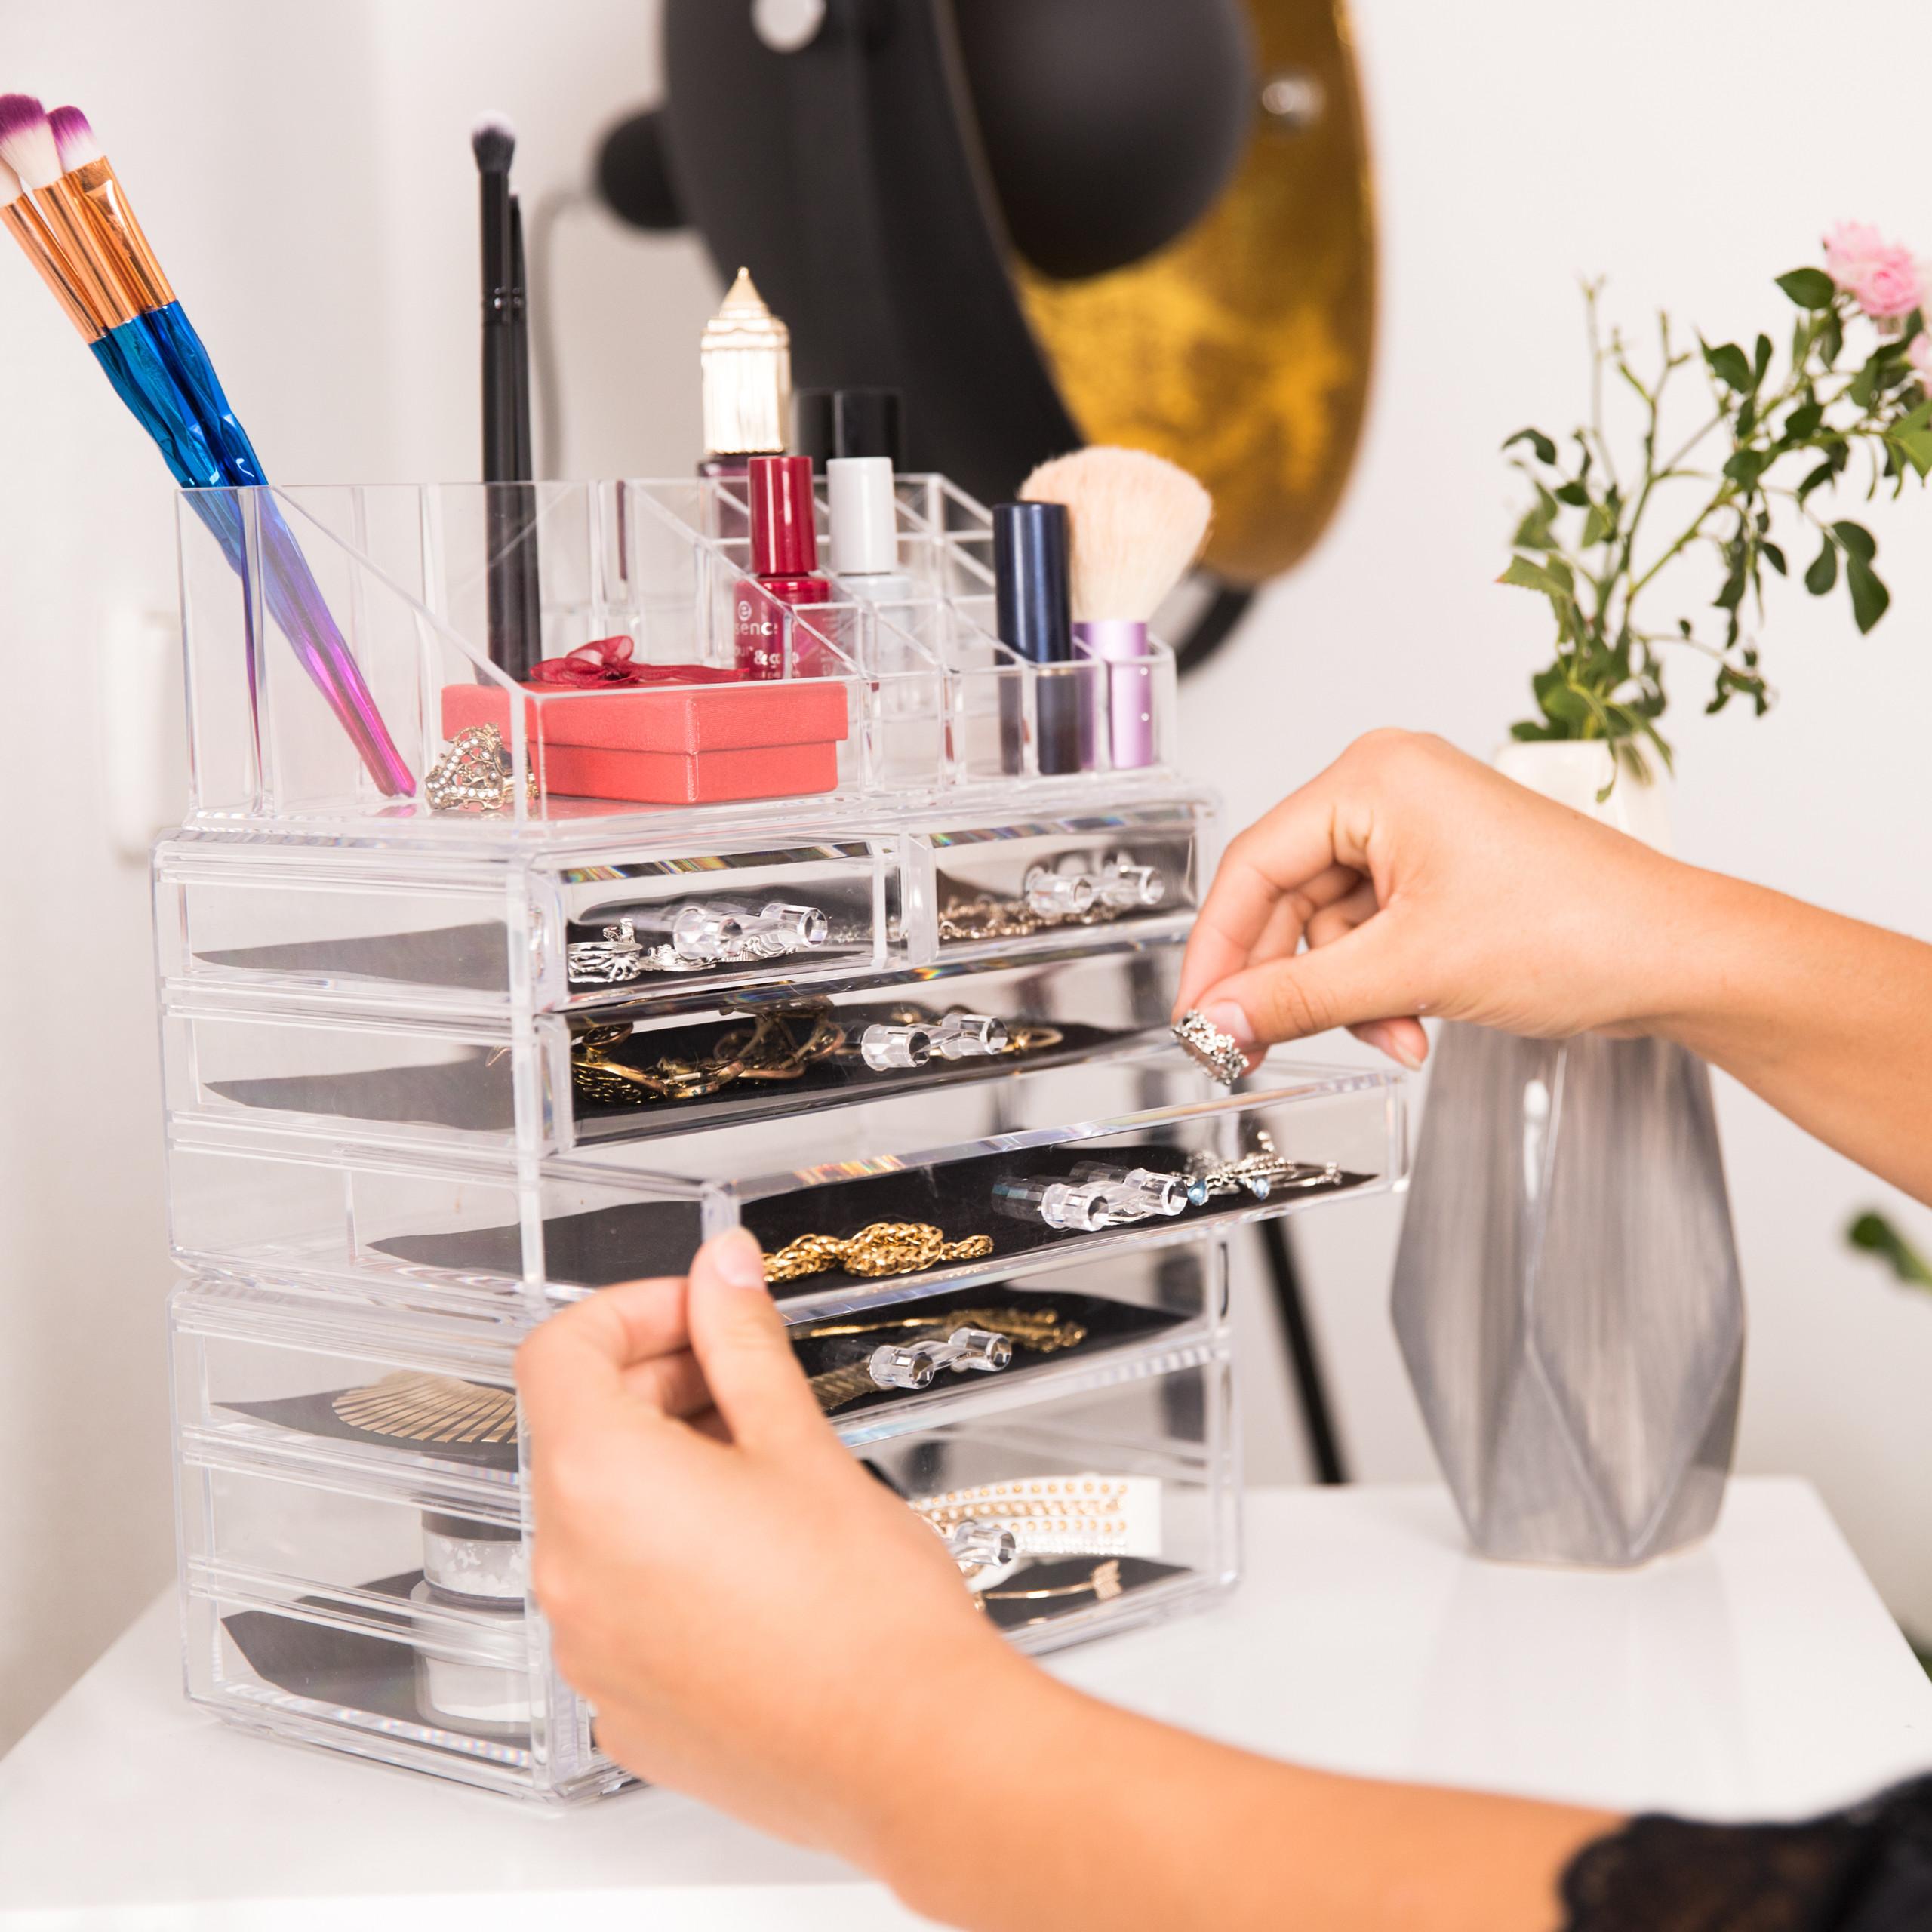 make-up-organizer-opbergen-van-cosmetica-acryl-stapelbaar-met-lades miniatuur 20